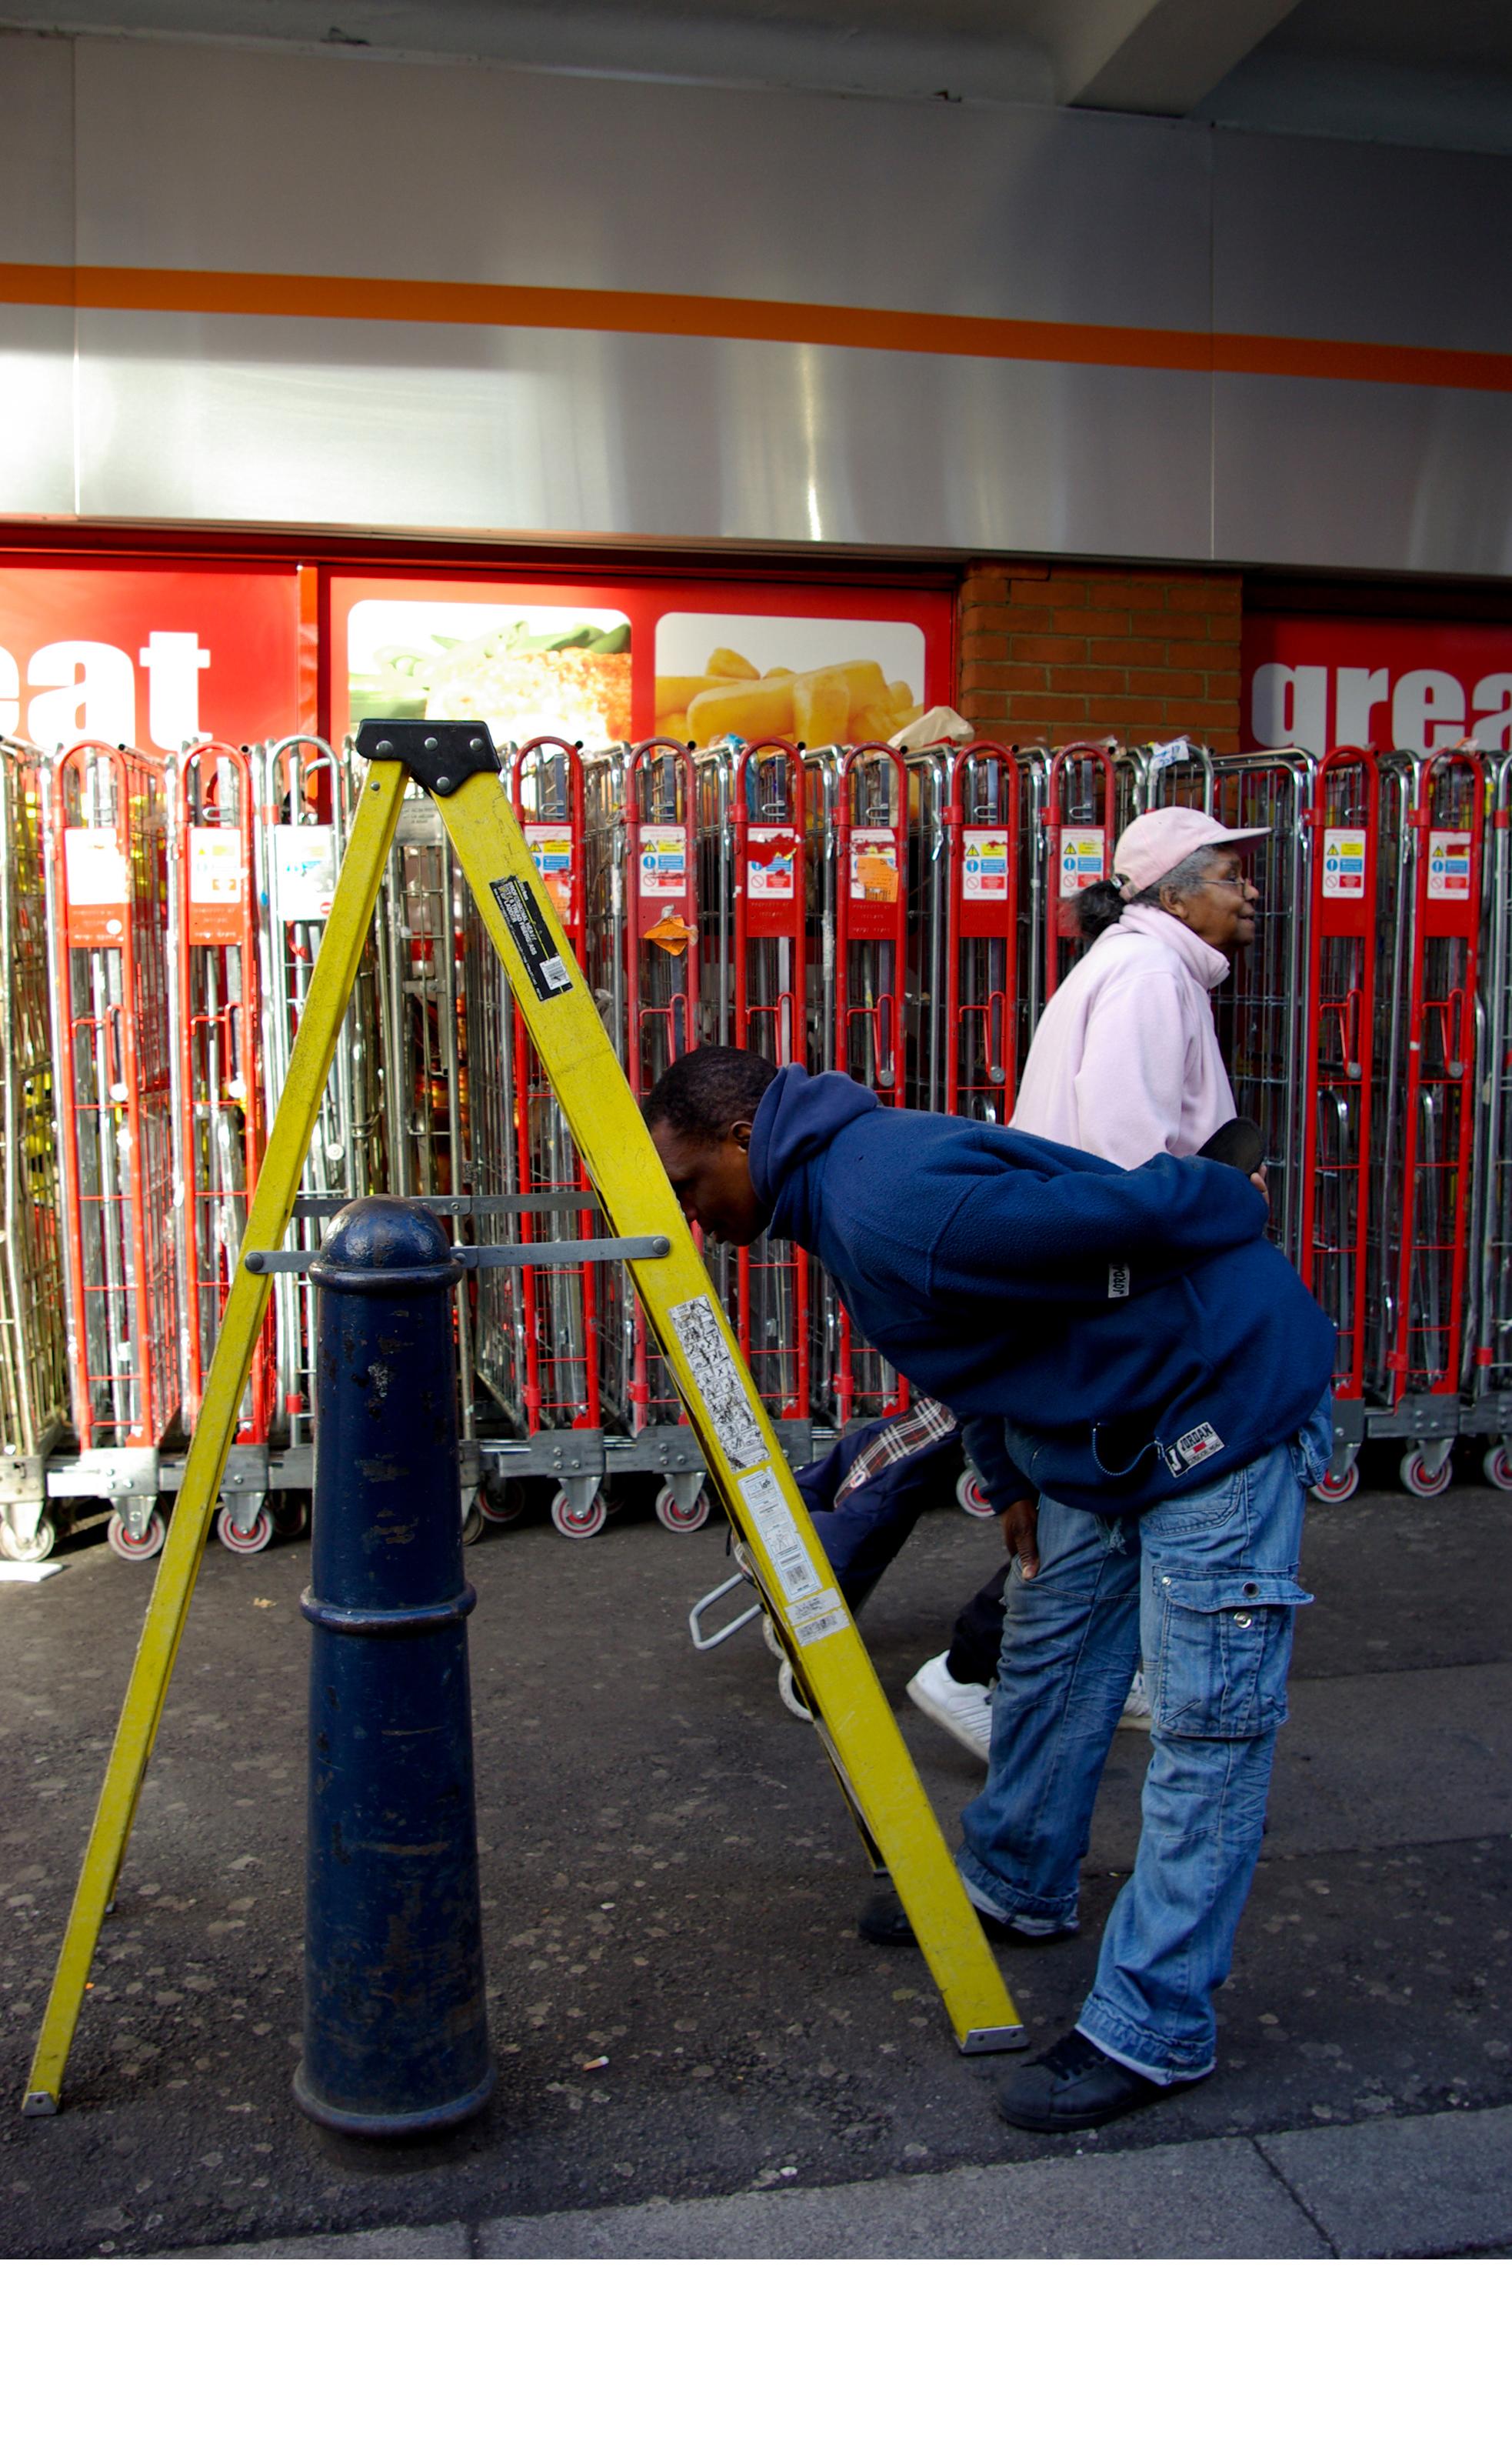 10 - Ladder 2013, London UK, C Print